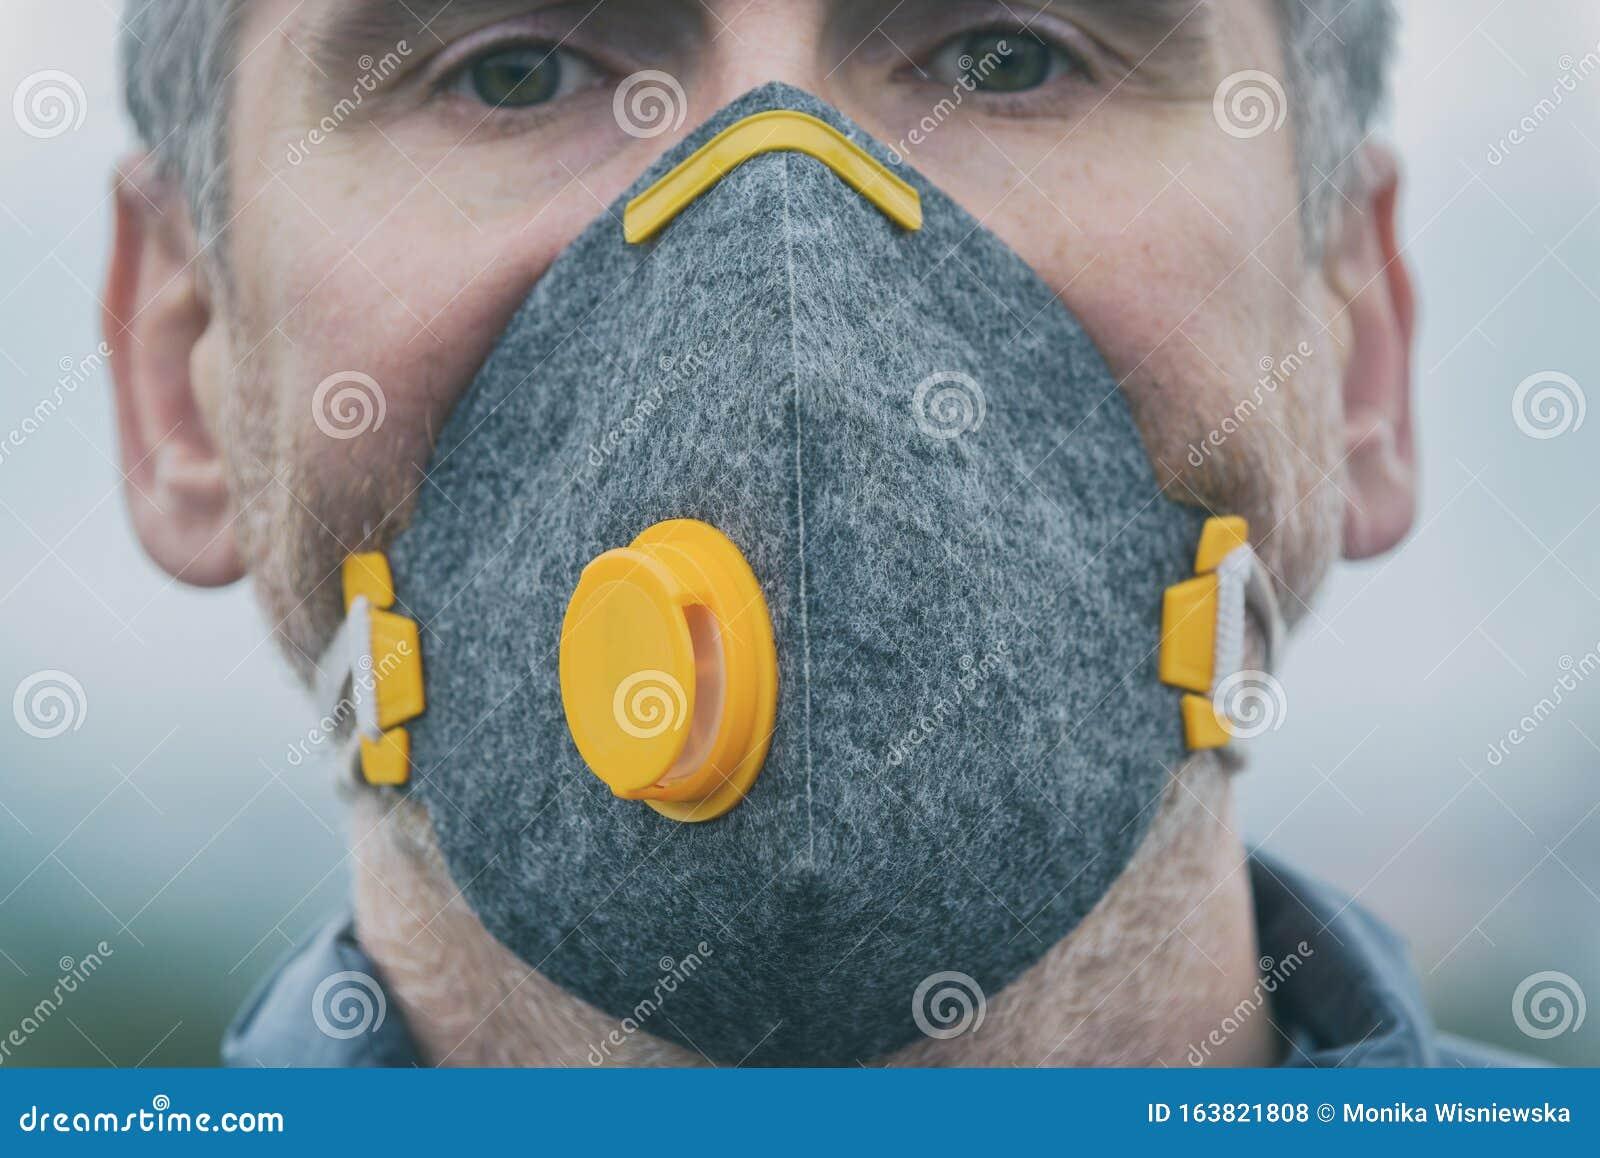 anti virus mouth mask